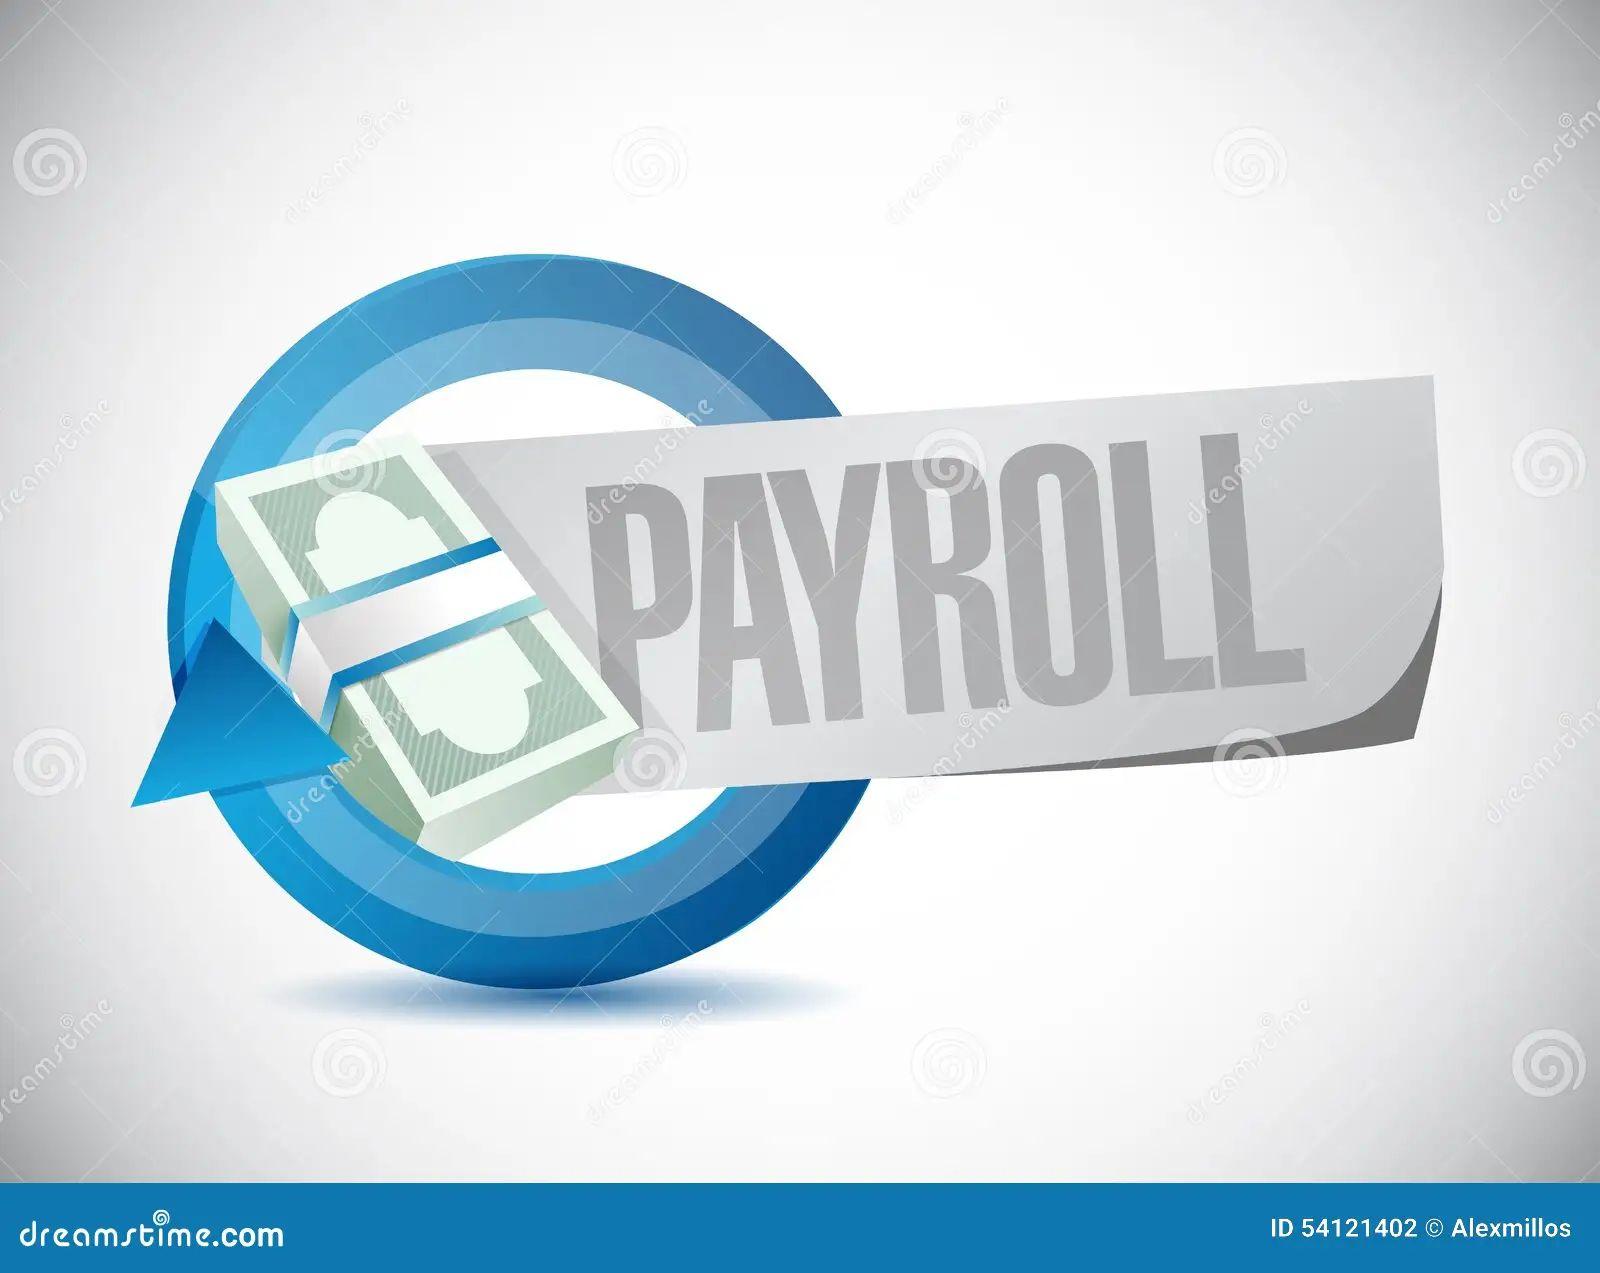 payroll documents